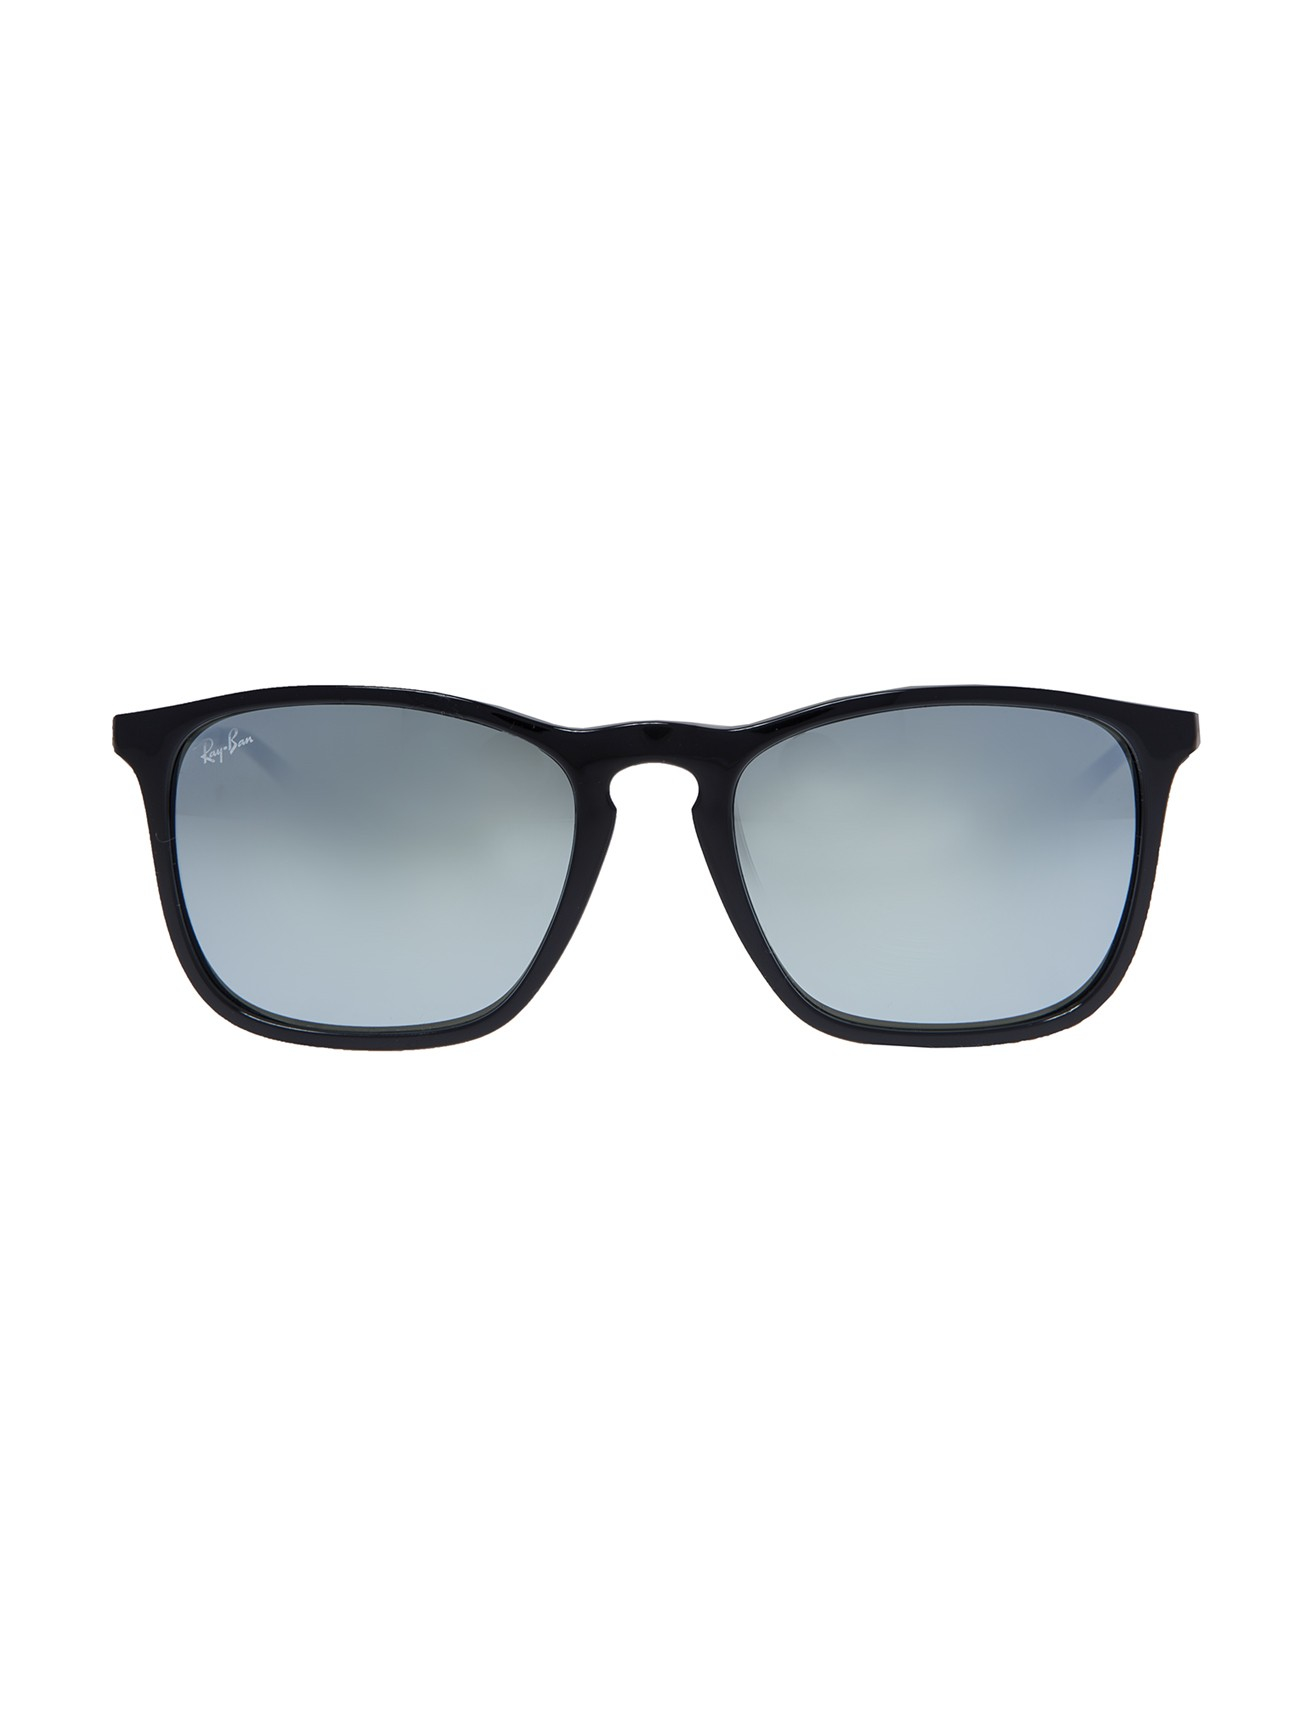 Ray-ban Chris Mirror Frame Sunglasses in Black Lyst